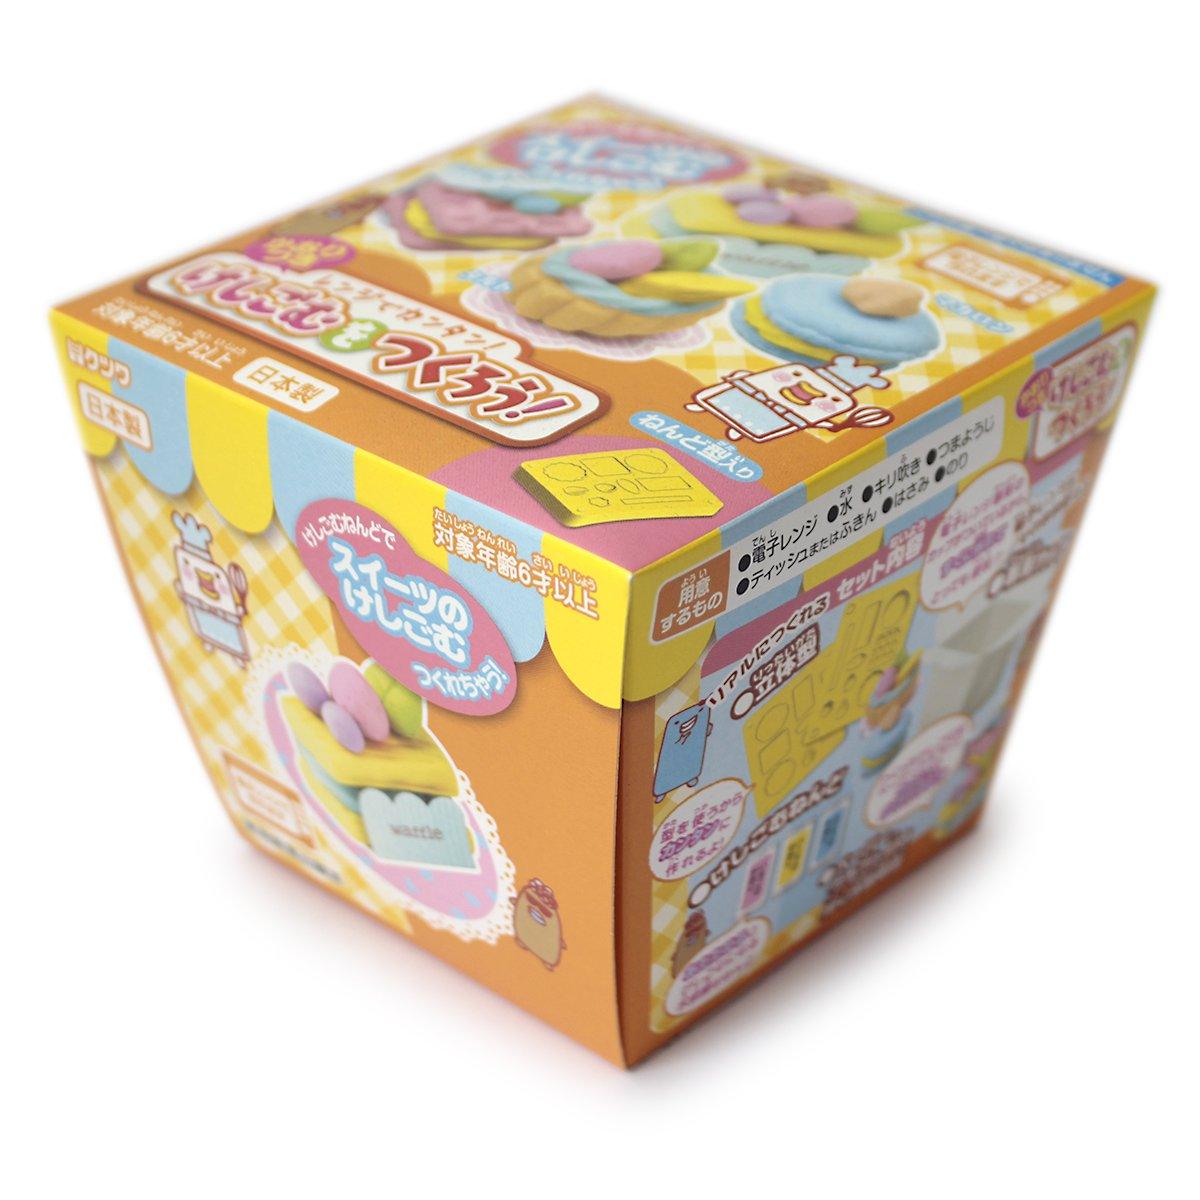 Amazon diy eraser making kit to make yourself sweets eraser amazon diy eraser making kit to make yourself sweets eraser with flavor office products solutioingenieria Image collections